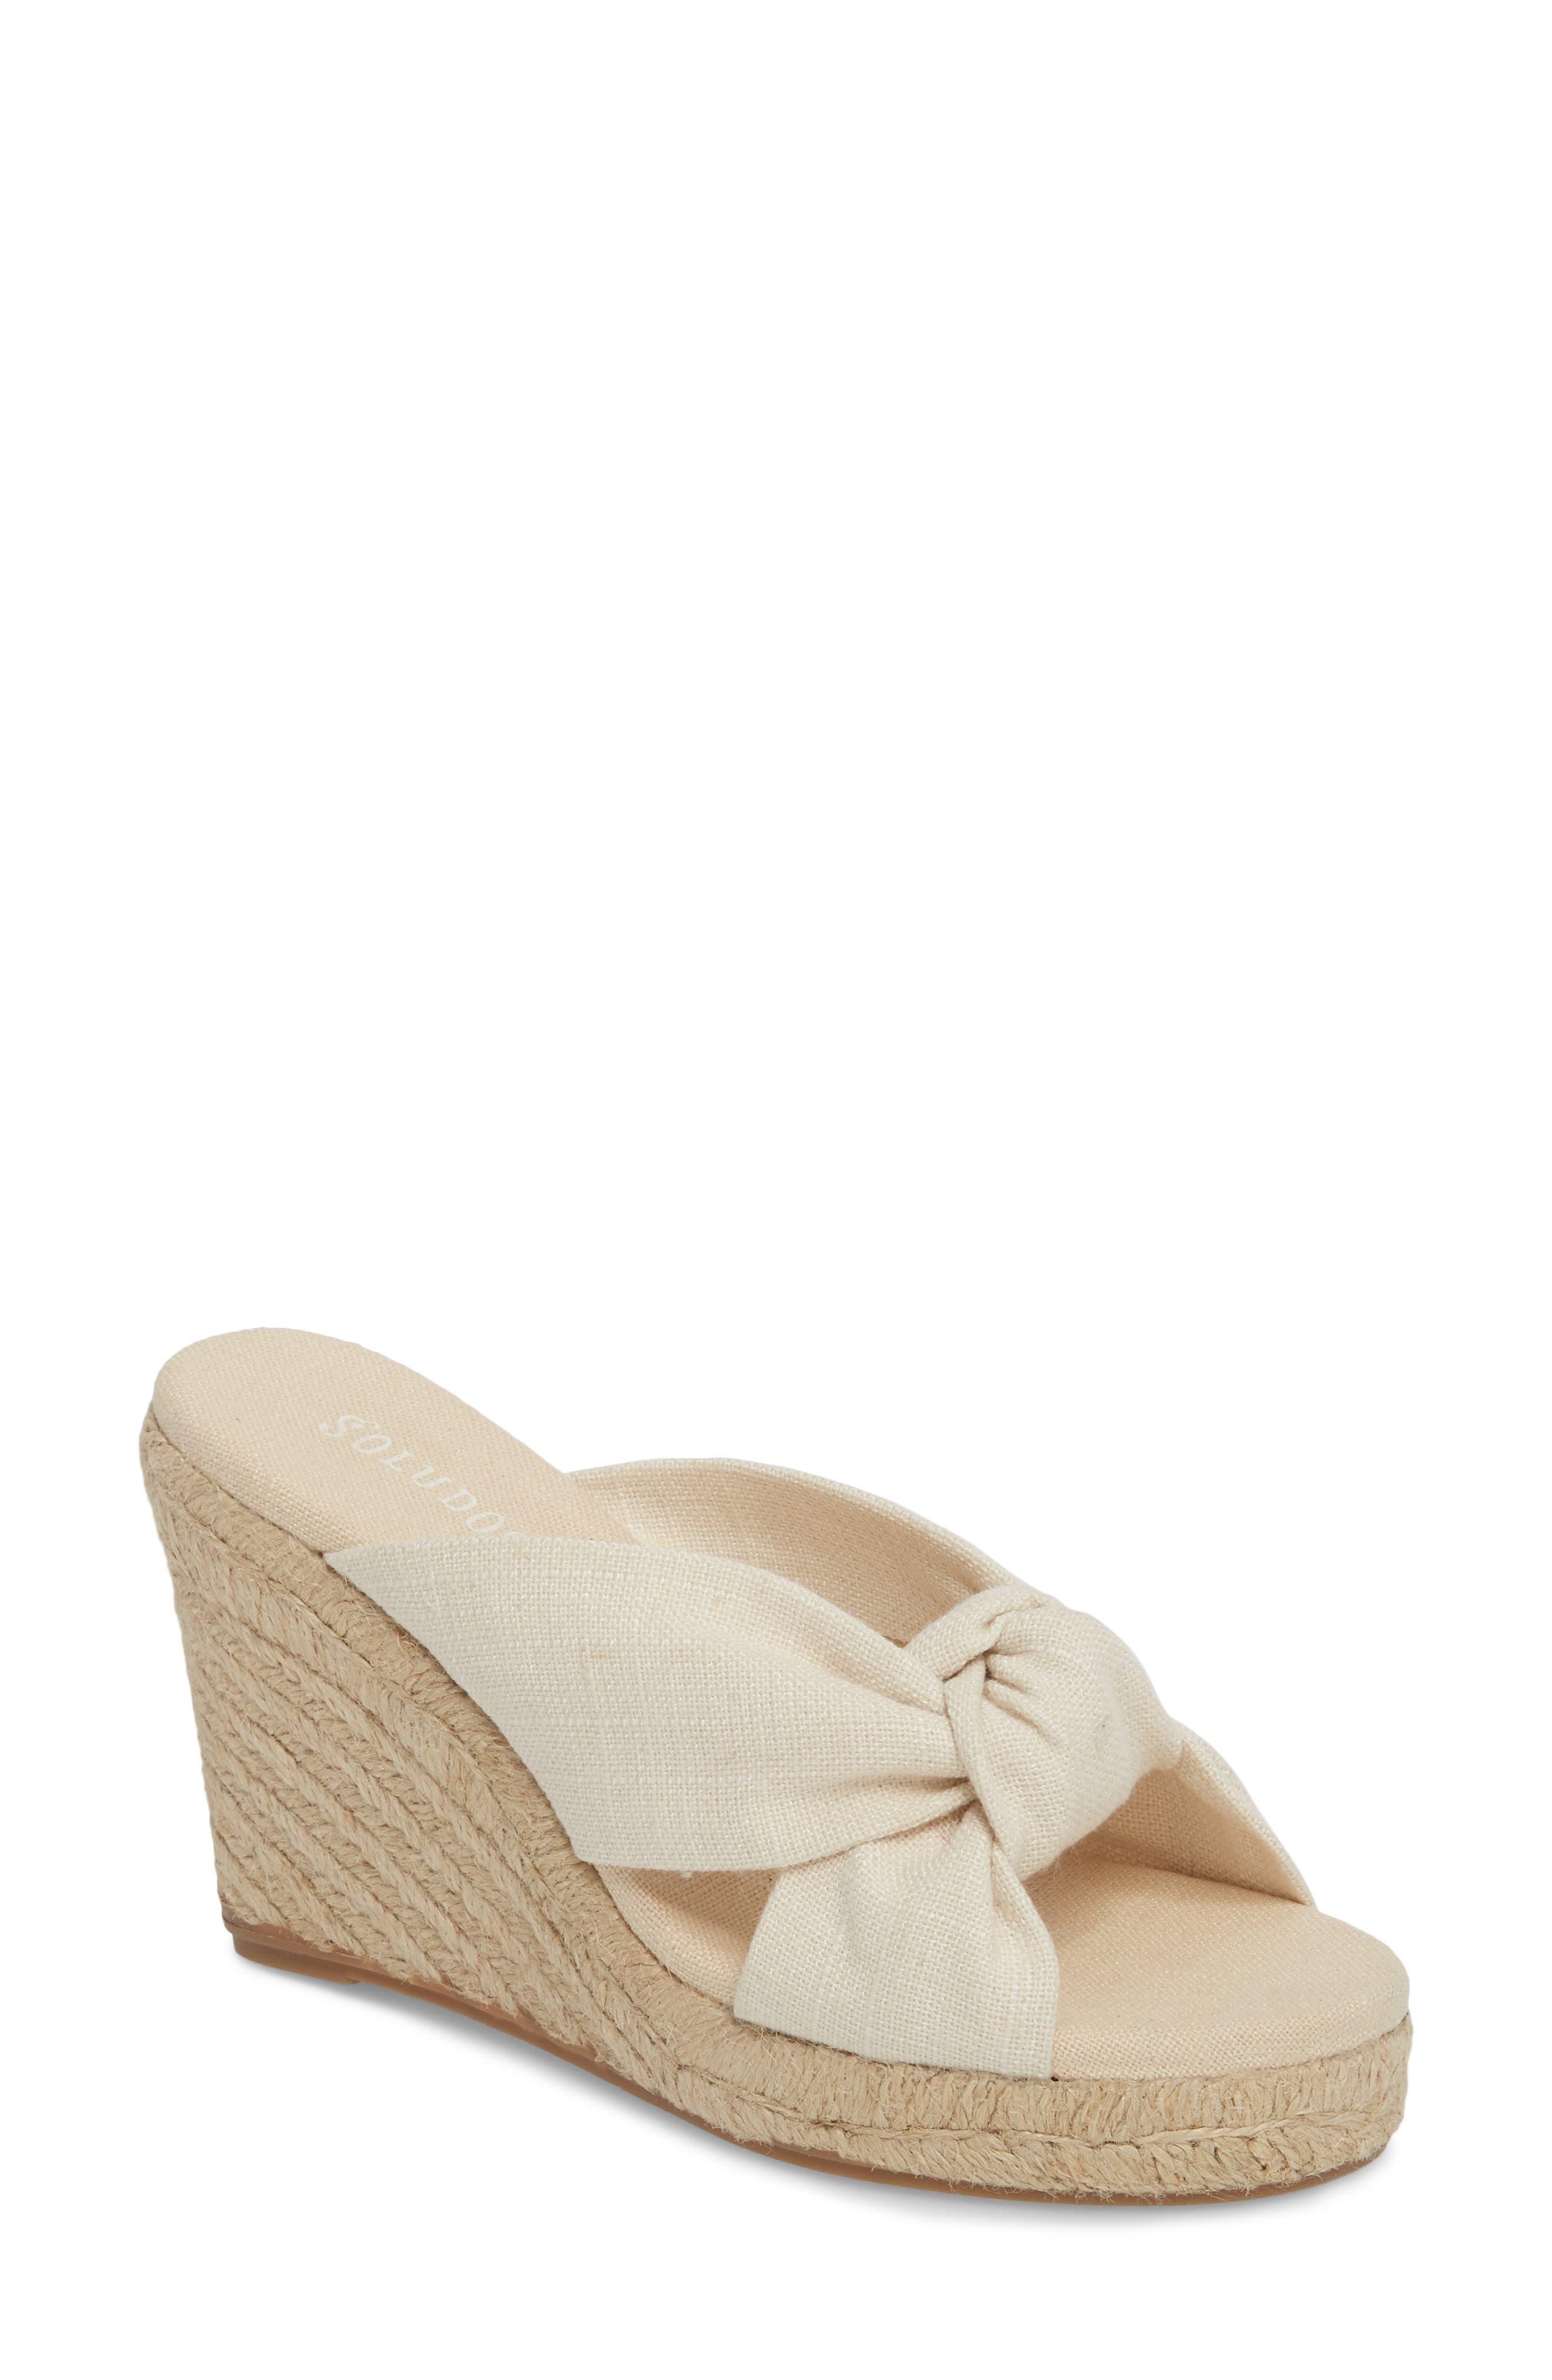 Espadrille Wedge Sandal,                         Main,                         color, Blush